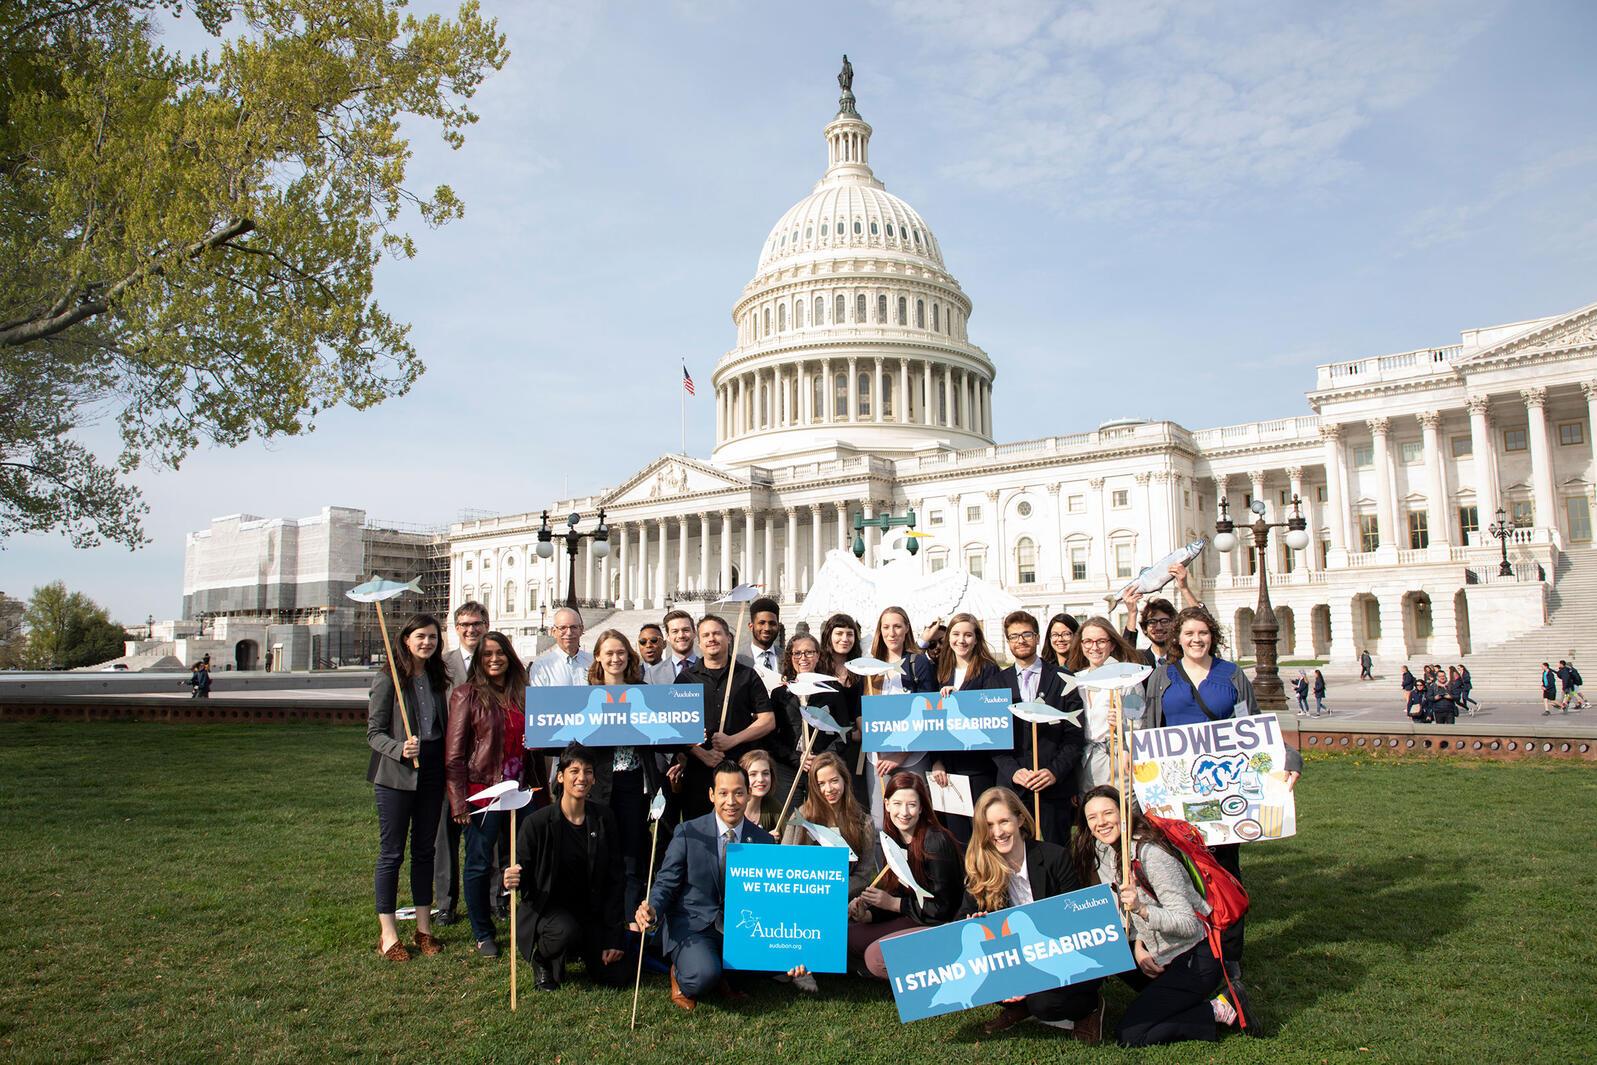 Audubon staff and members lobby on behalf of seabirds and forage fish at the U.S. Capitol. Luke Franke/Audubon